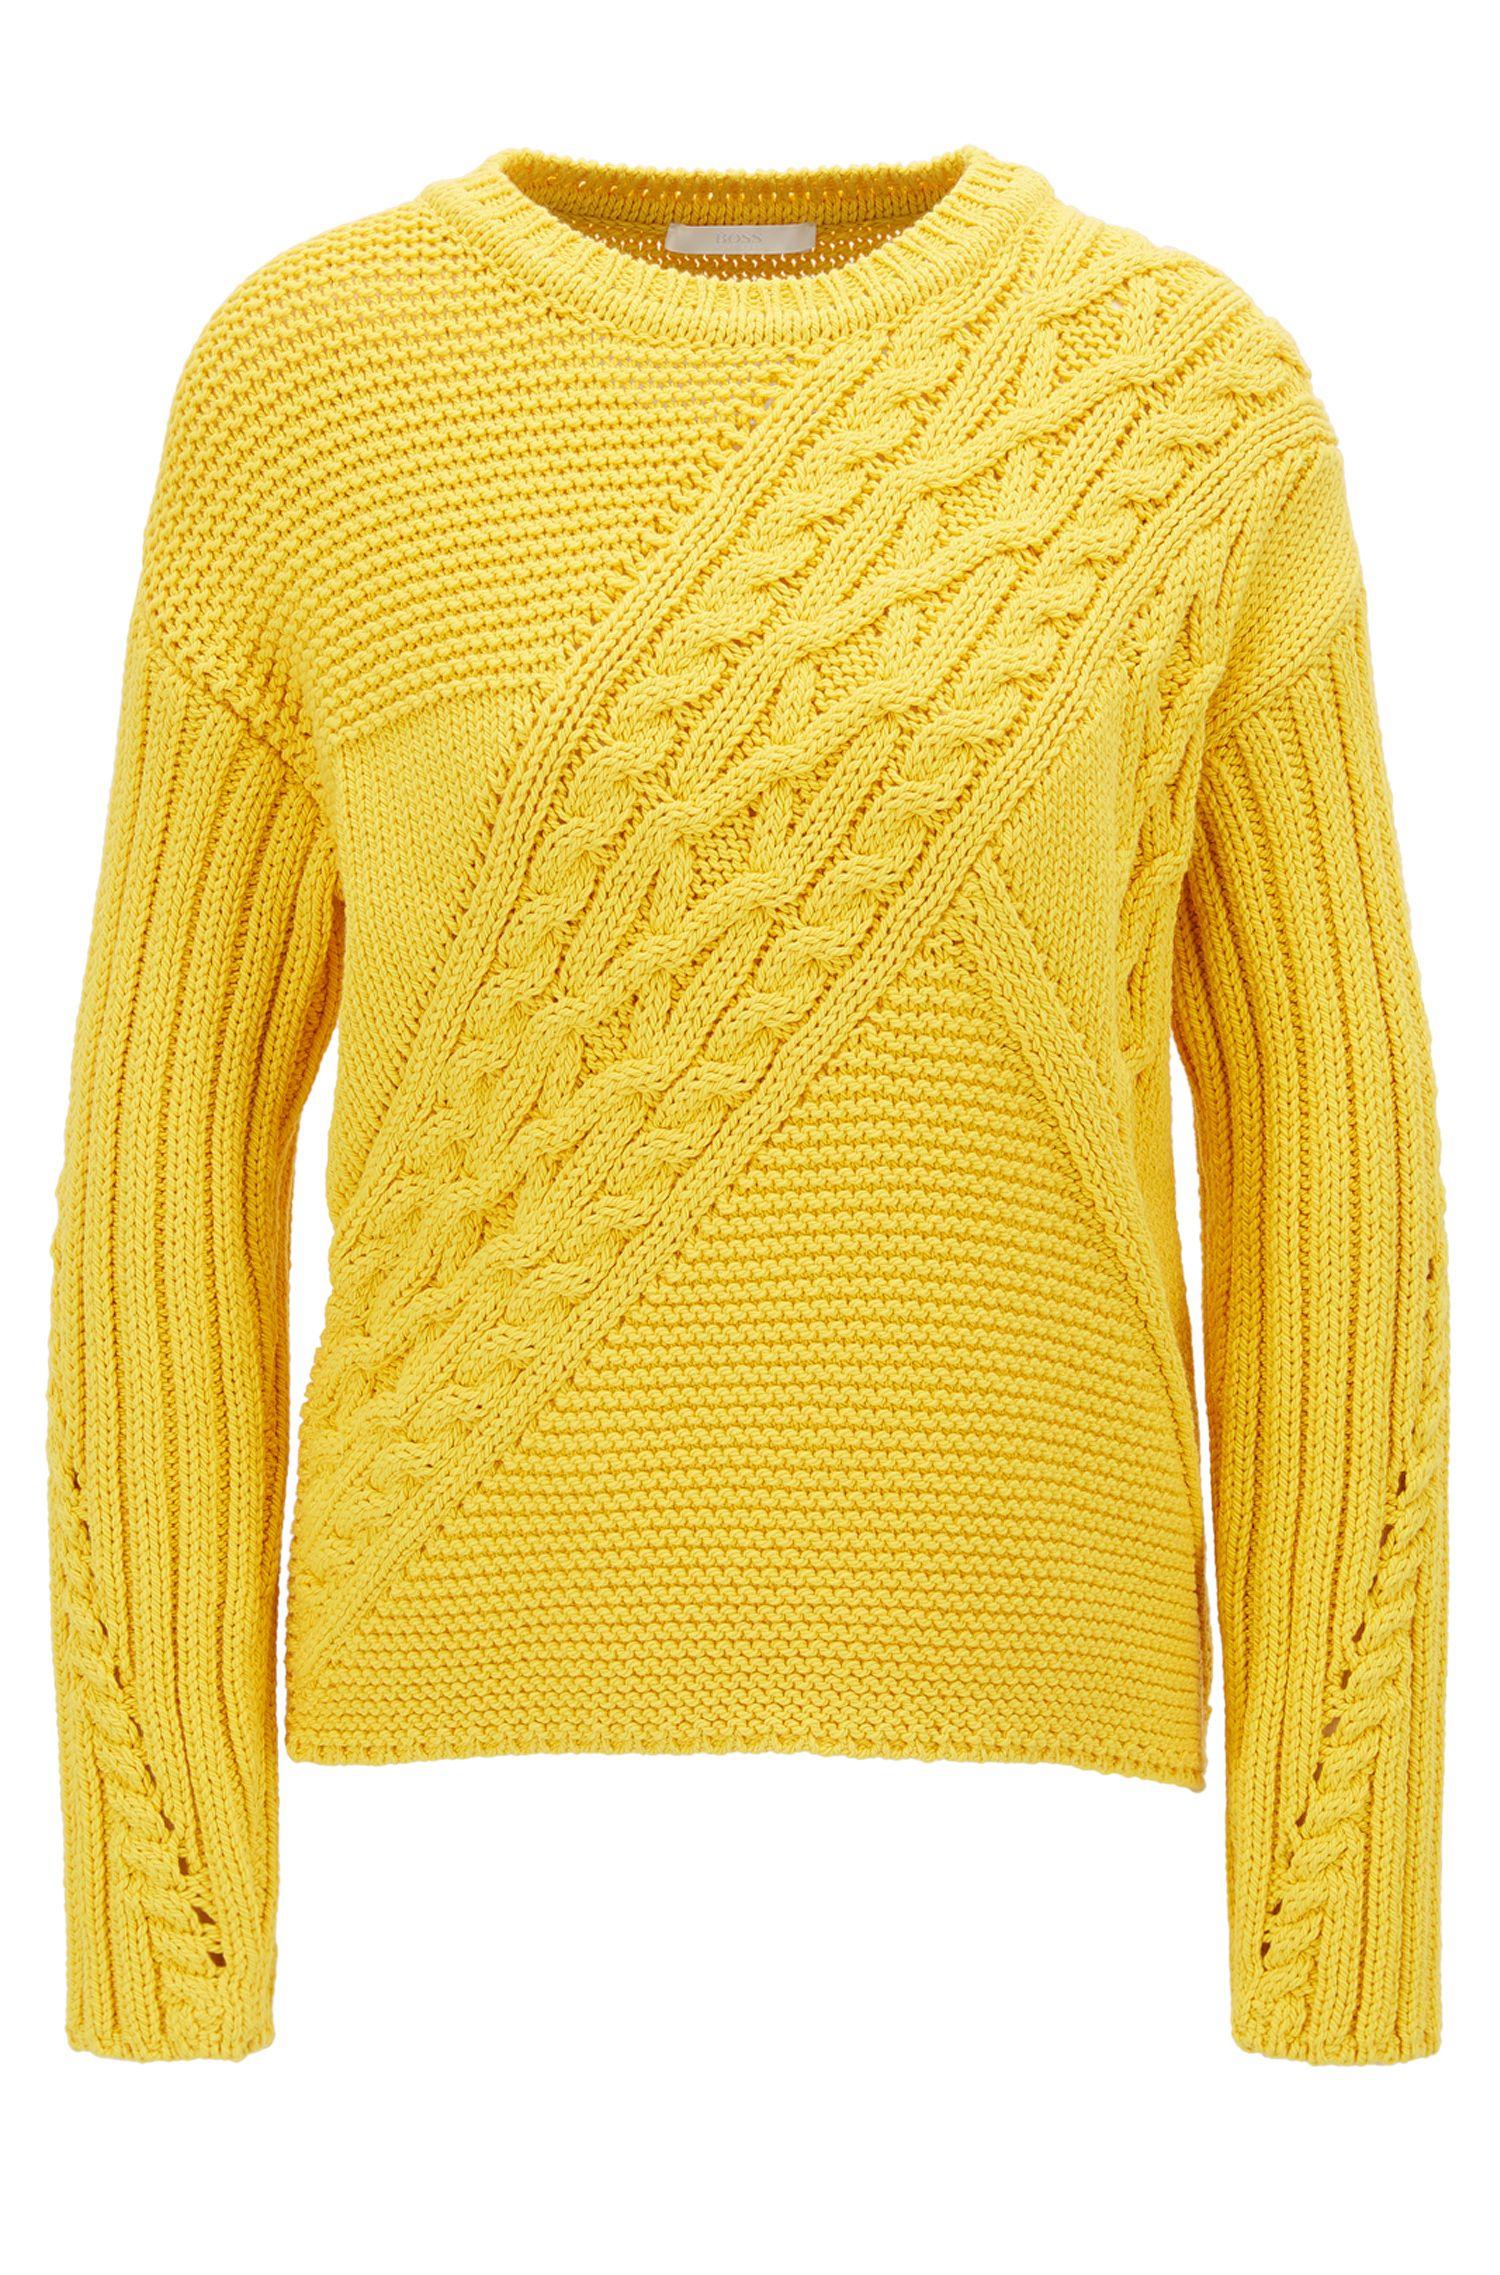 Jersey de punto patchwork en mezcla de algodón